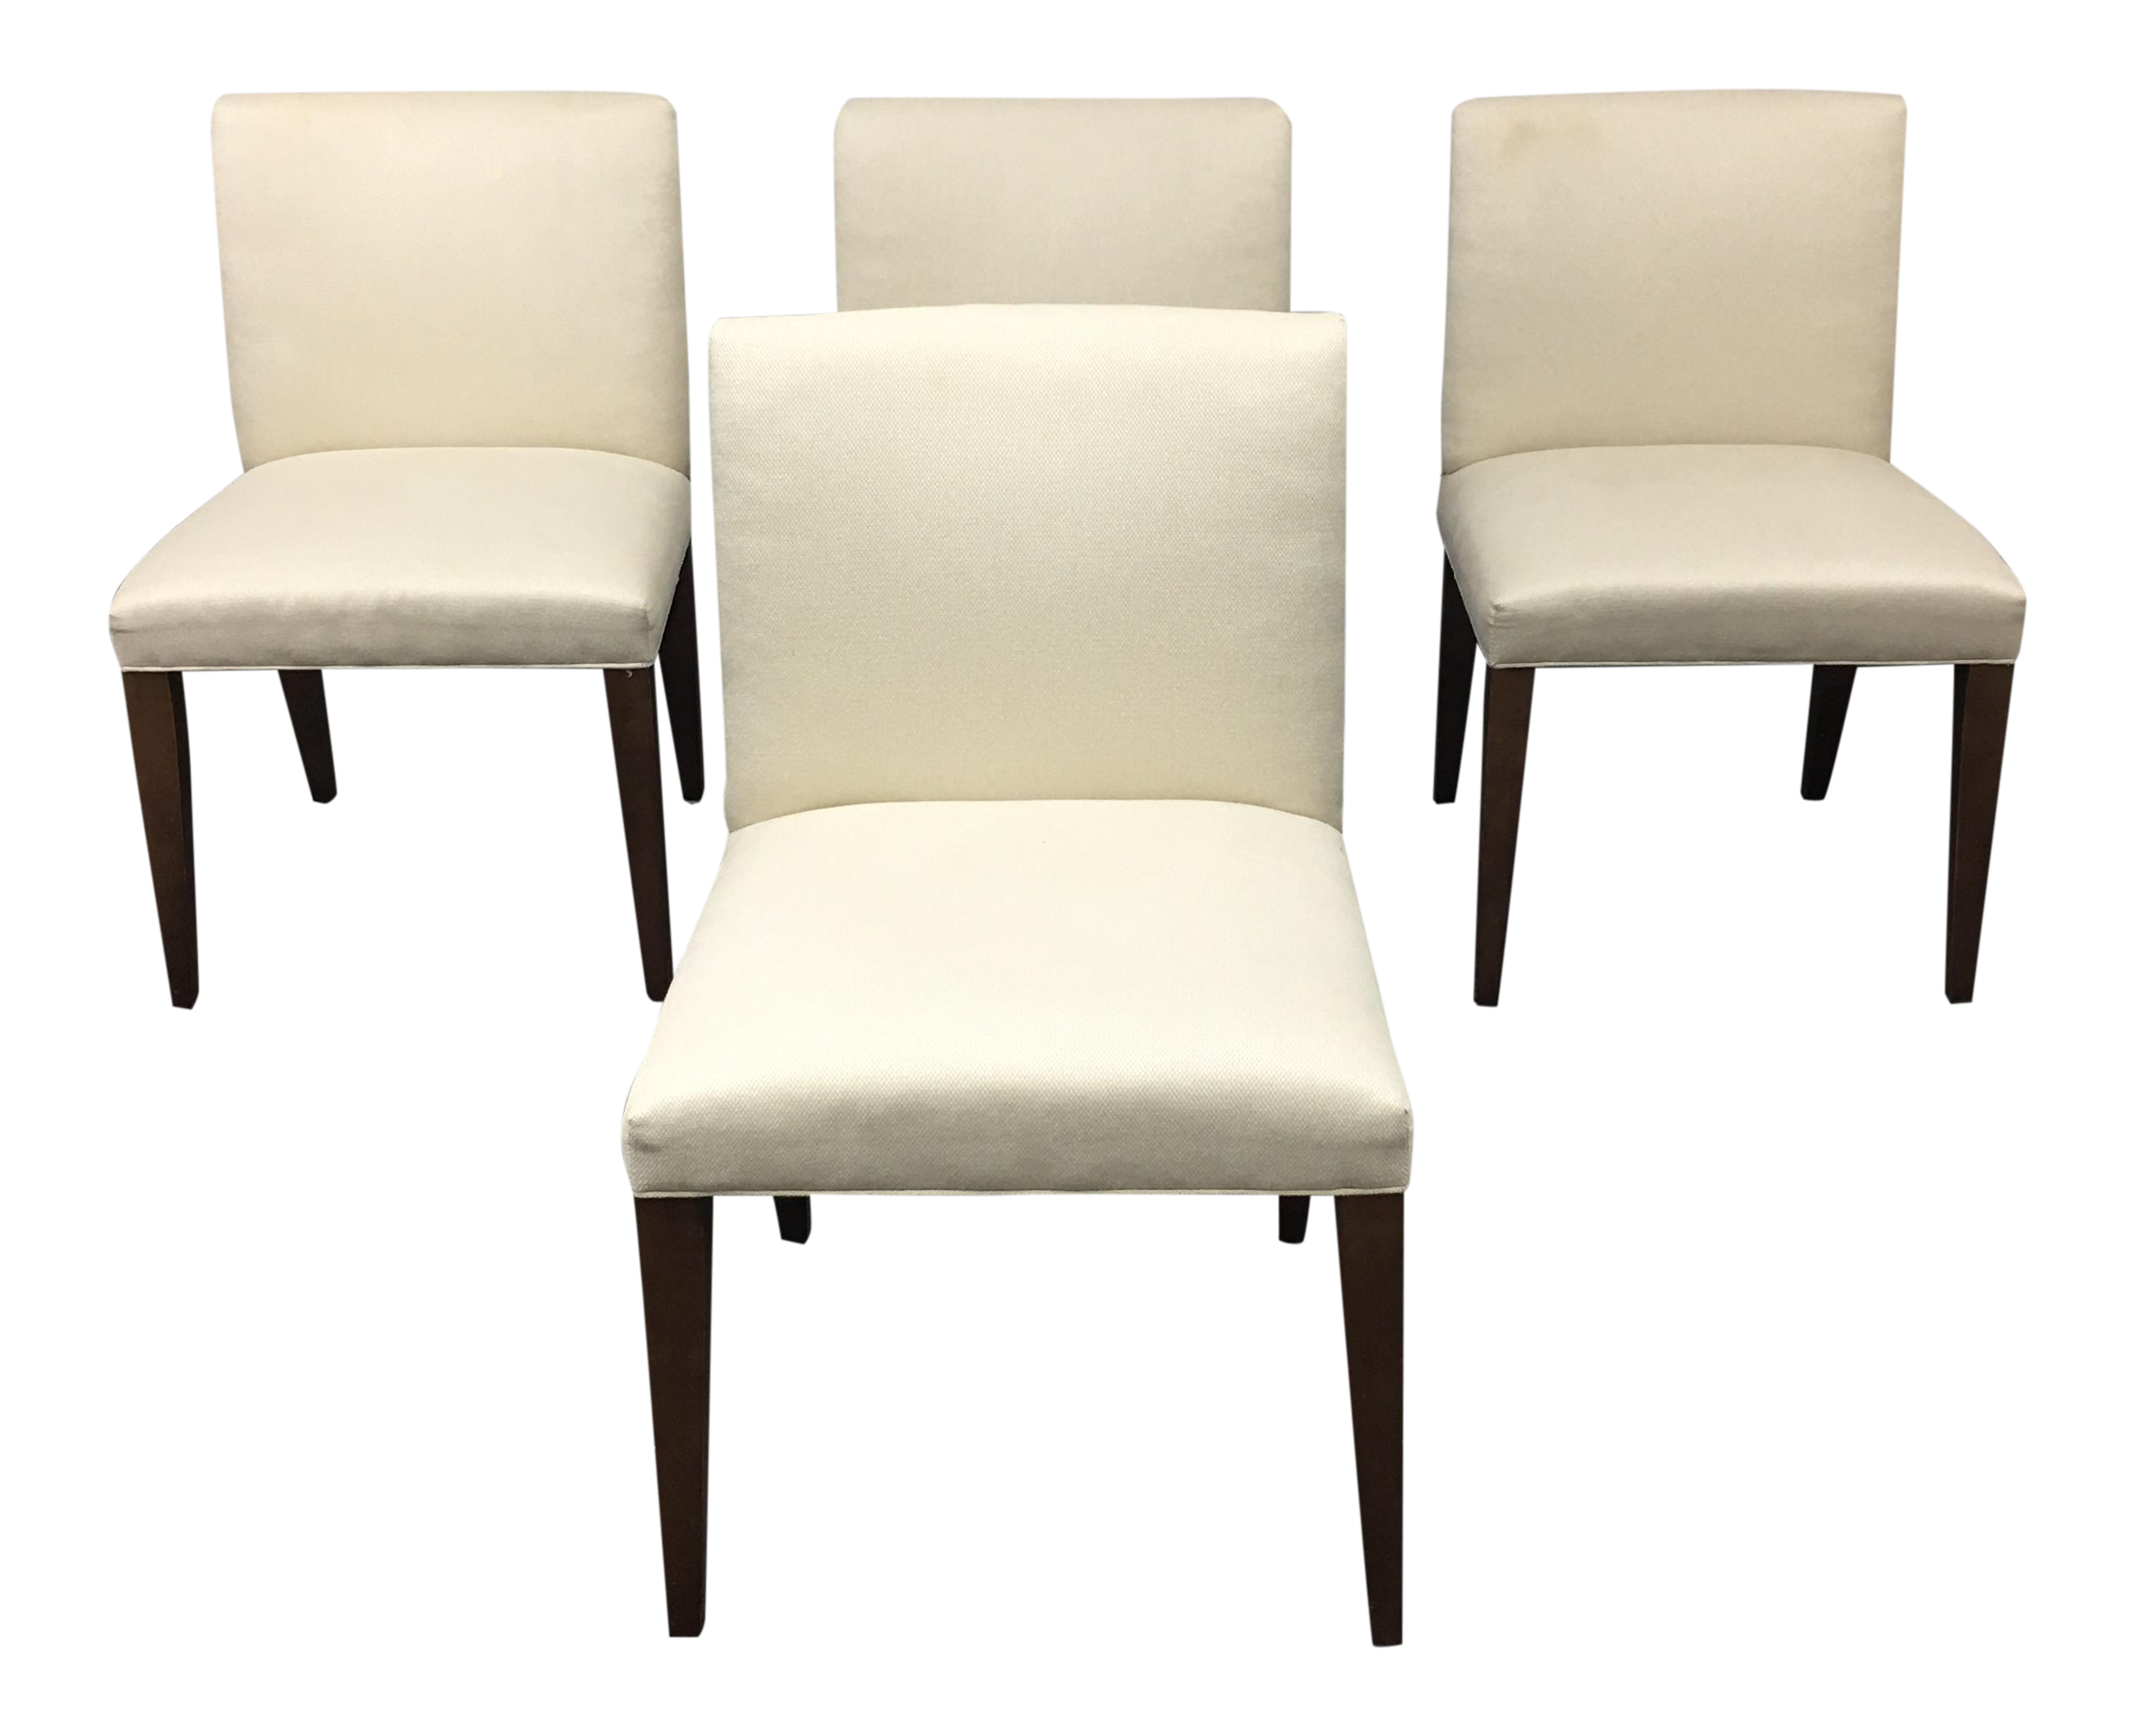 unique furniture best board room sofa conceptstructuresllc and com ian